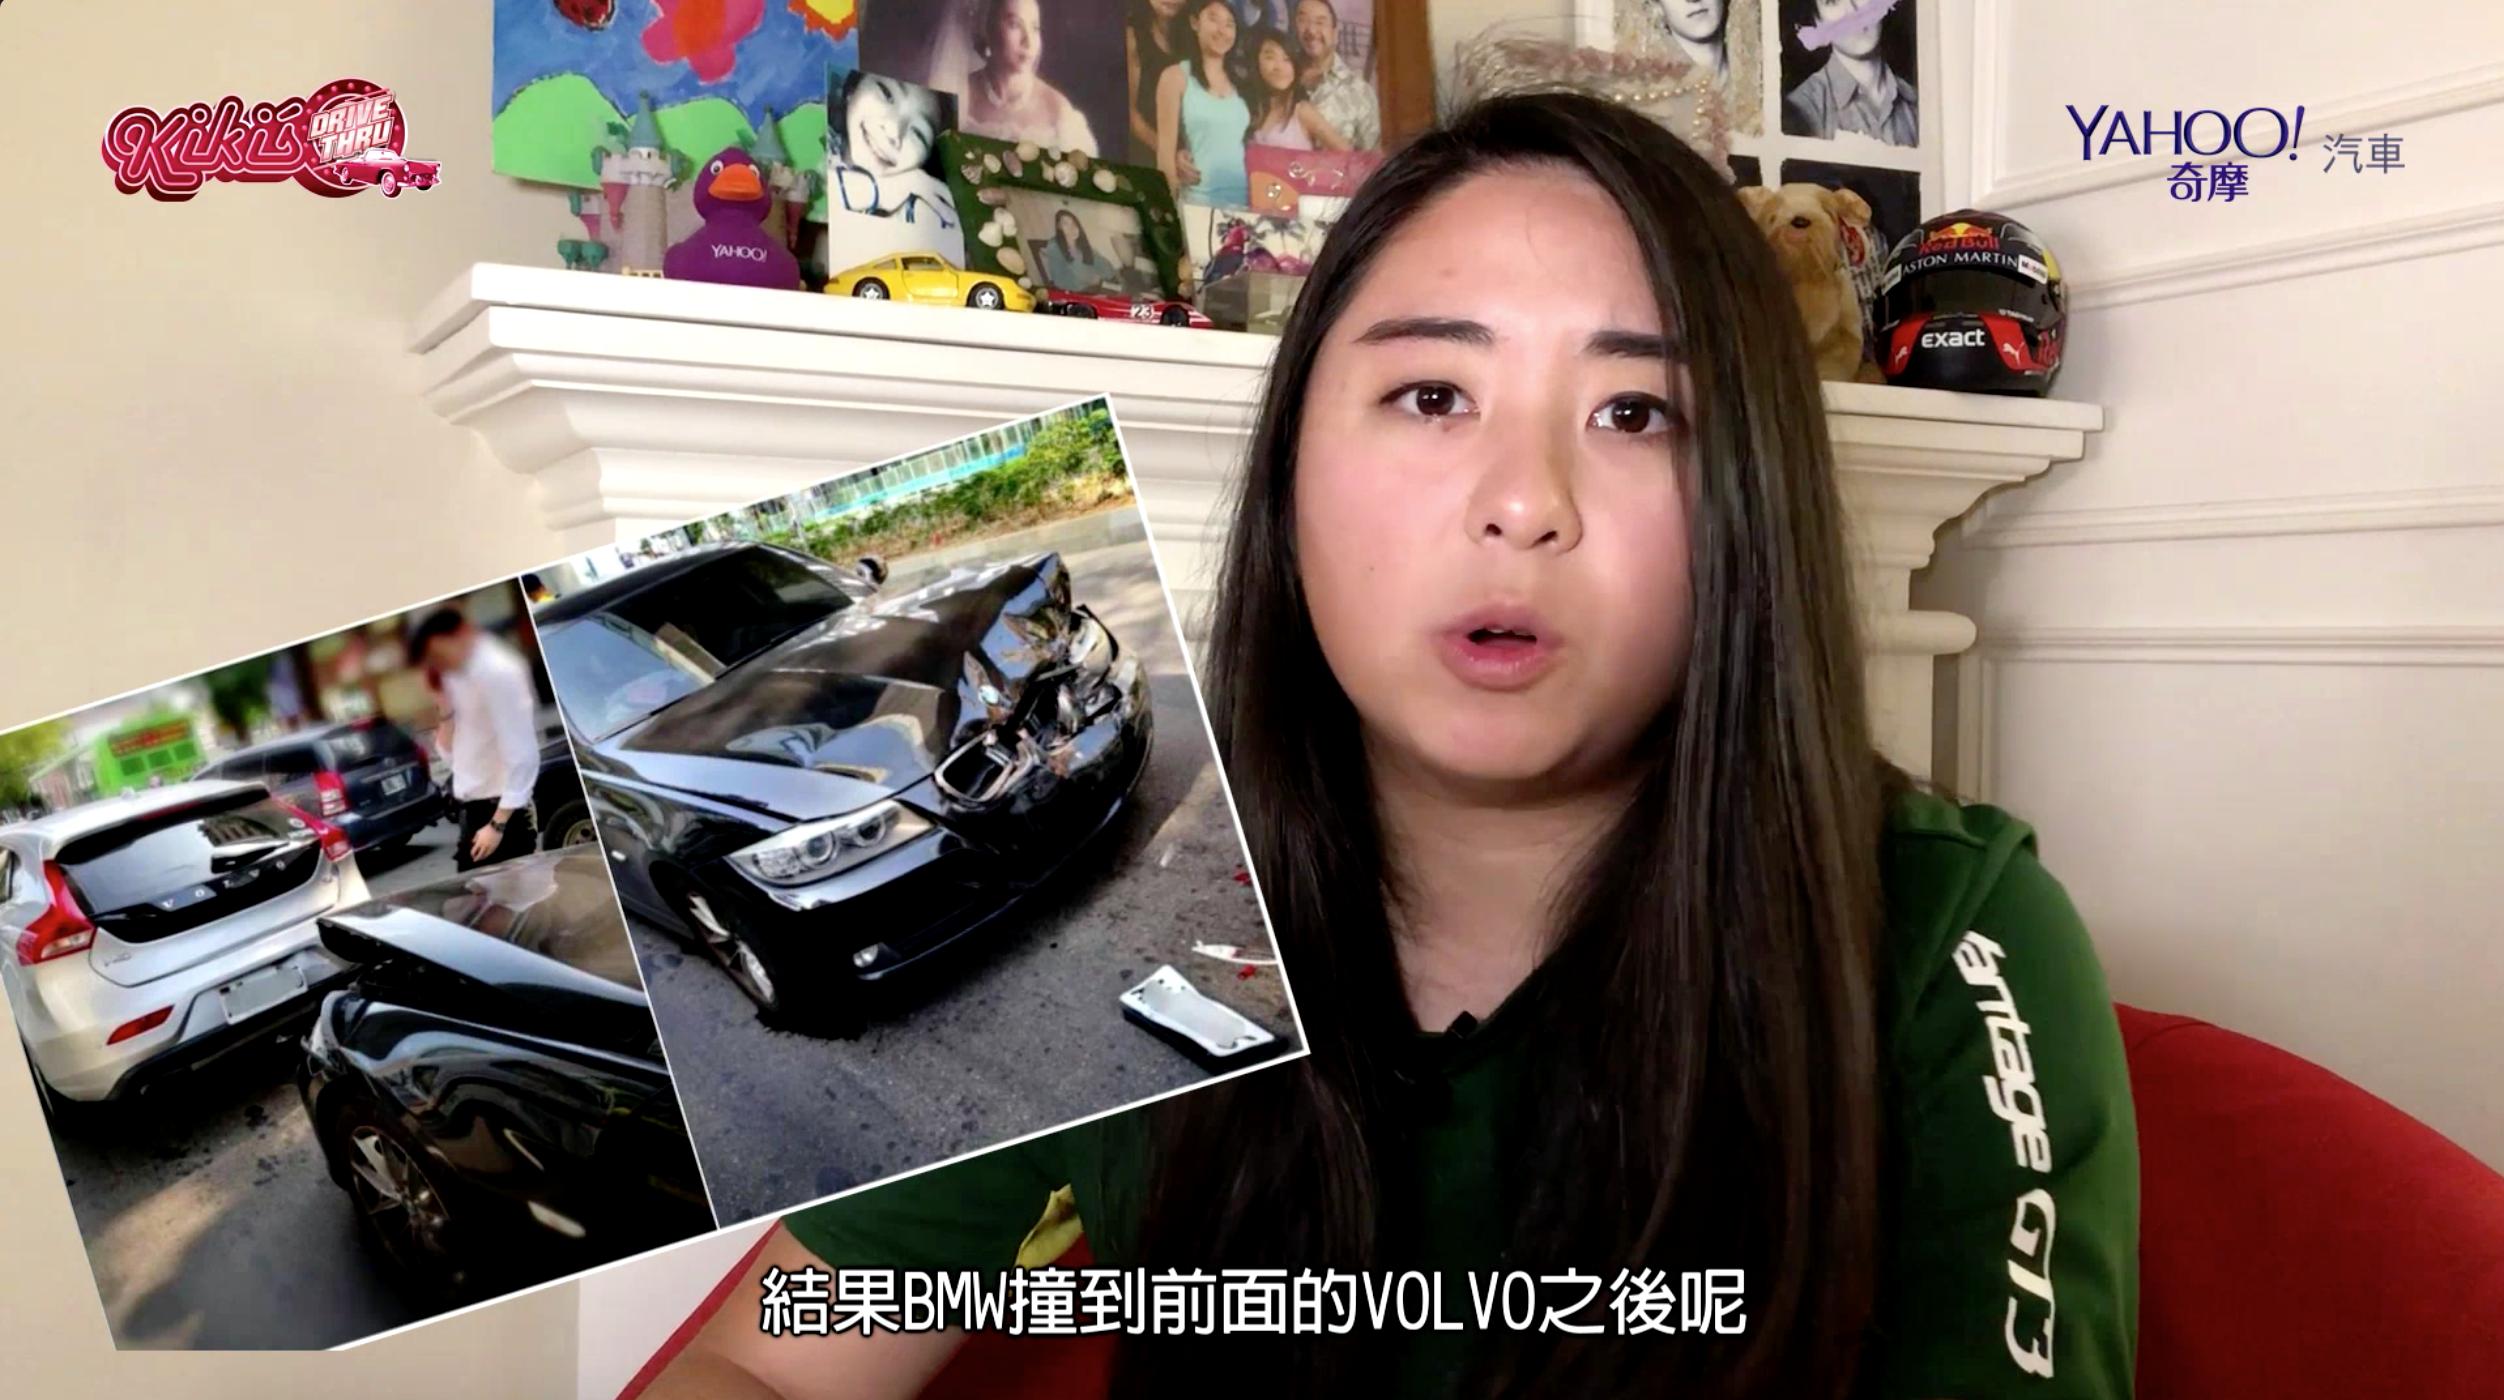 【Kiki's Drive-Thru】Vol.3 F1車手Hamilton抱怨摩納哥大賽 / BMW撞上Volvo的結果是?